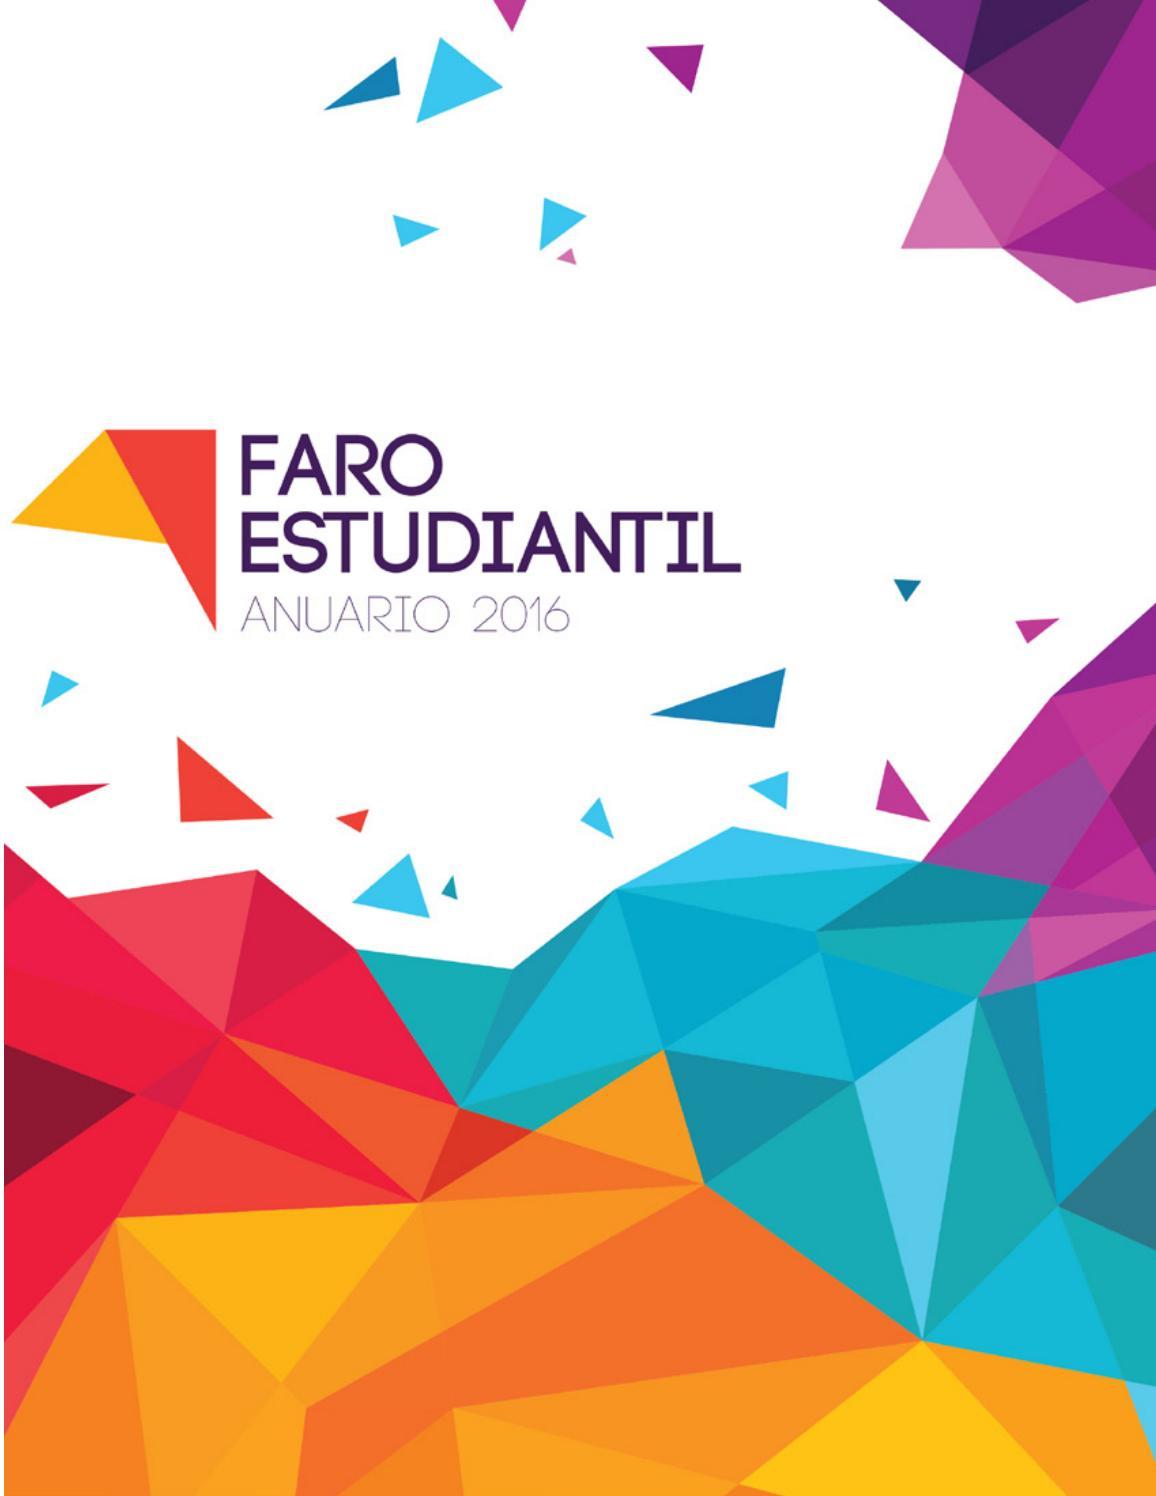 Revista Faro Anuario 2016 By Isa Perez Diseno Editorial Issuu